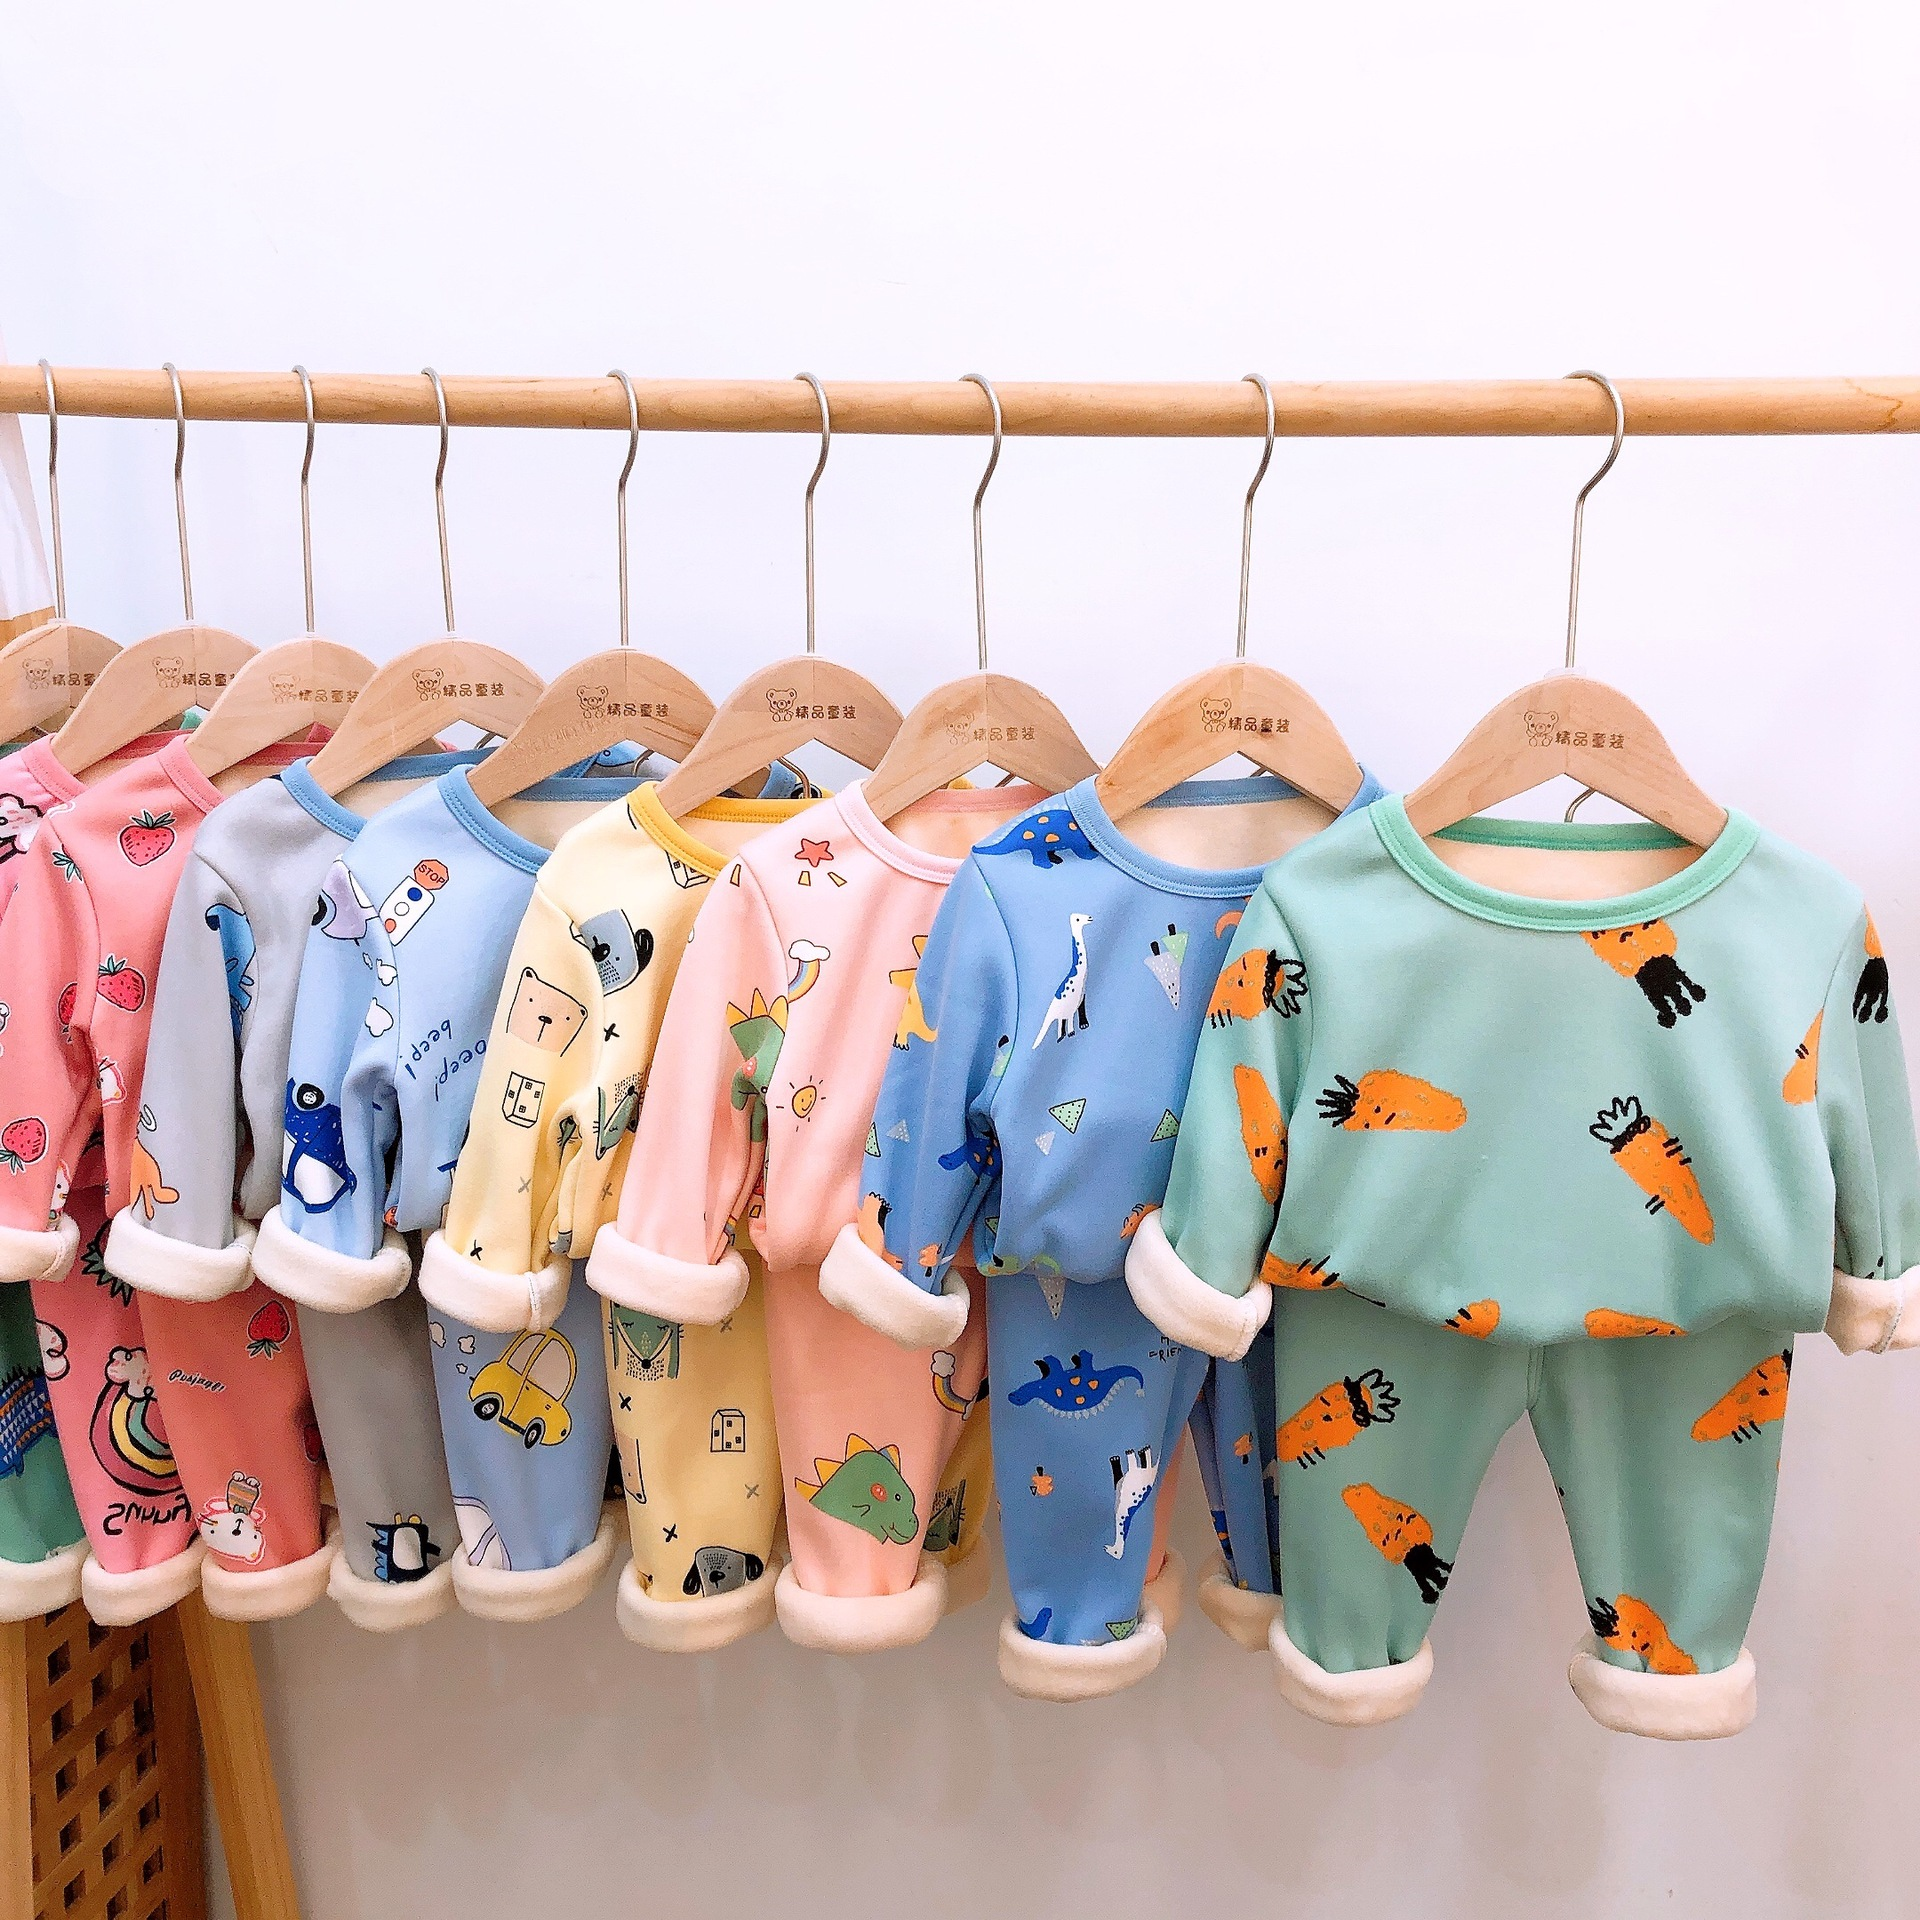 2021 Autumn Winter Thicken Velvet Children Pajamas Cartoon Family Boys Girls Clothing Set Kids Casual Sleepwear Suits Clothes 1